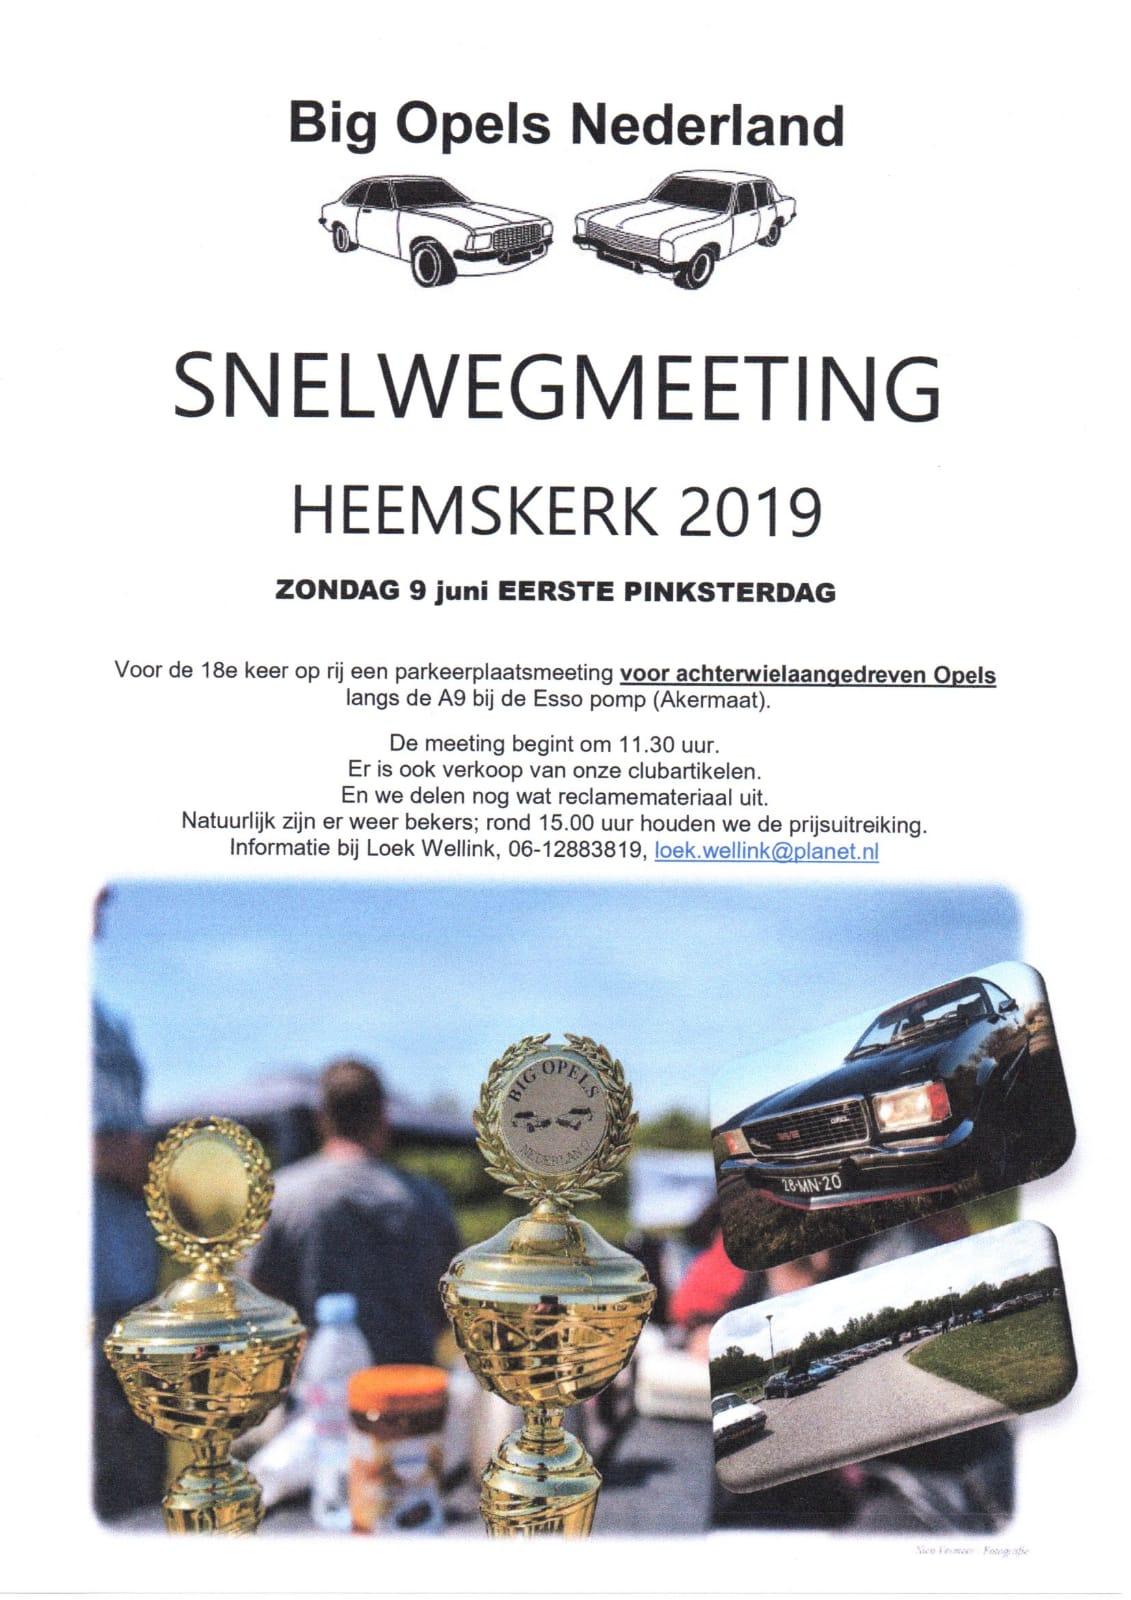 Big Opels Snelwegmeeting